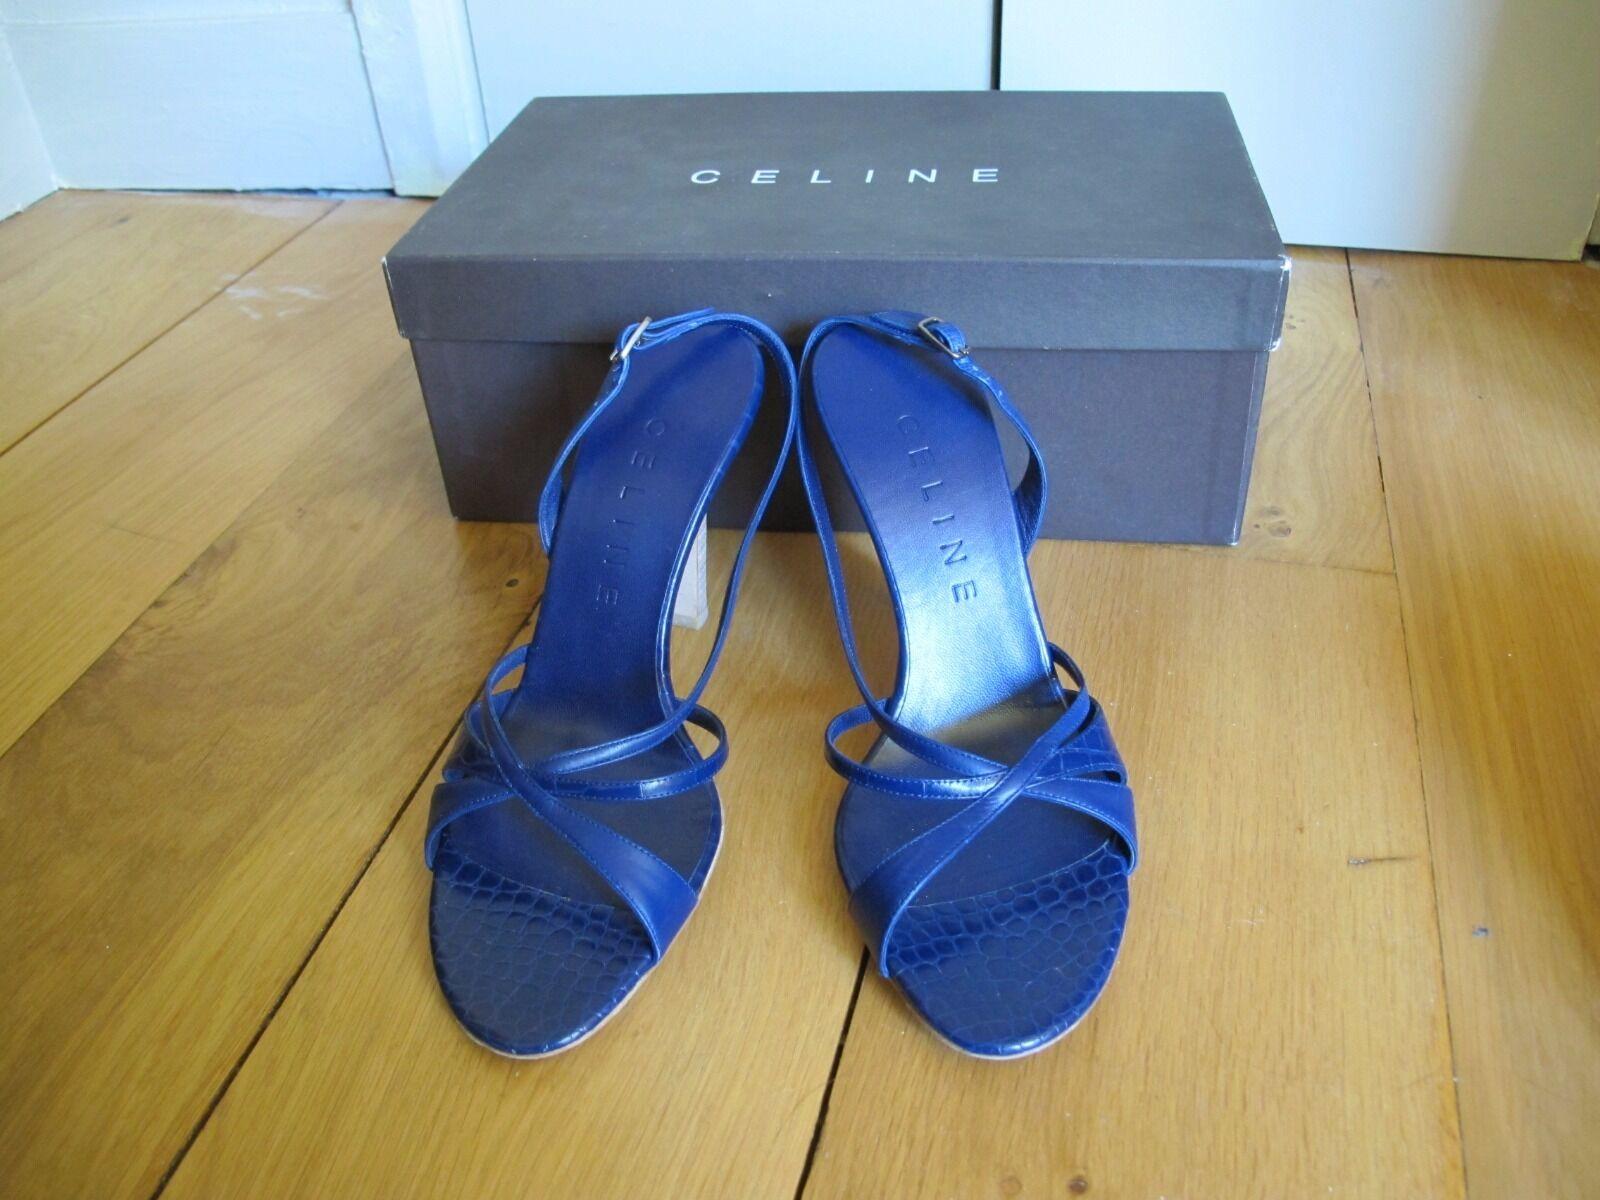 Sandales azules indigo CELINE 37C neuves neuves neuves  selección larga